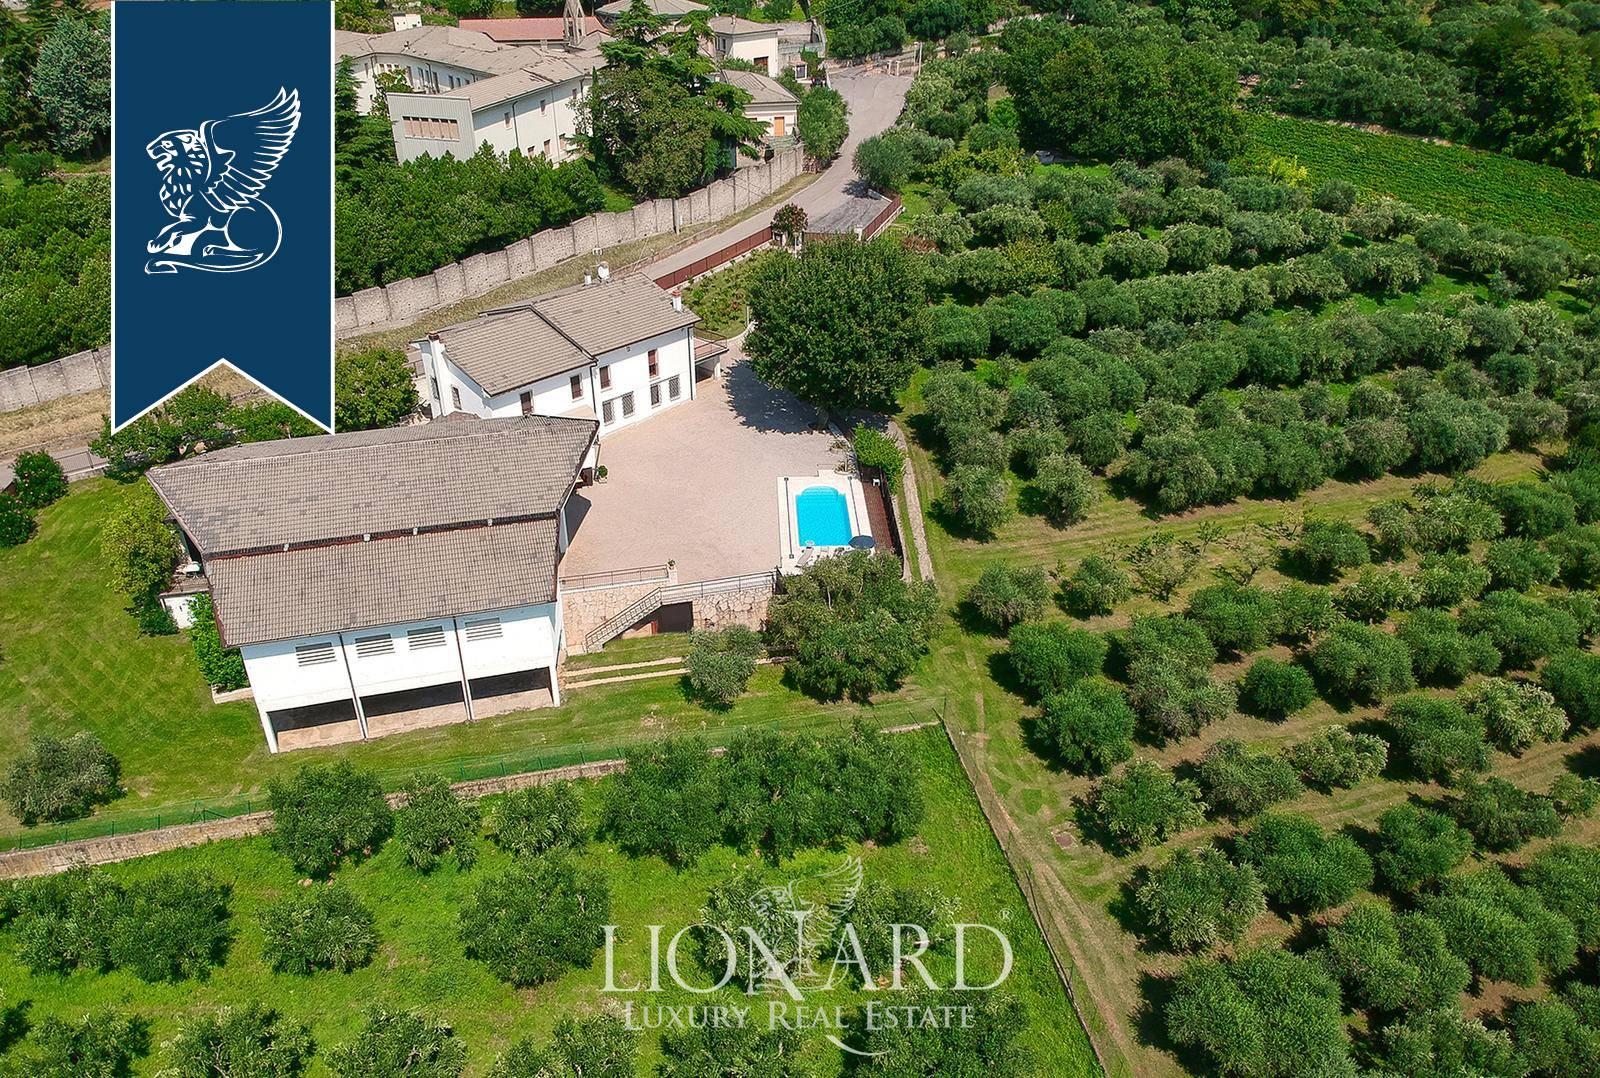 Villa in Vendita a Verona: 0 locali, 1000 mq - Foto 5